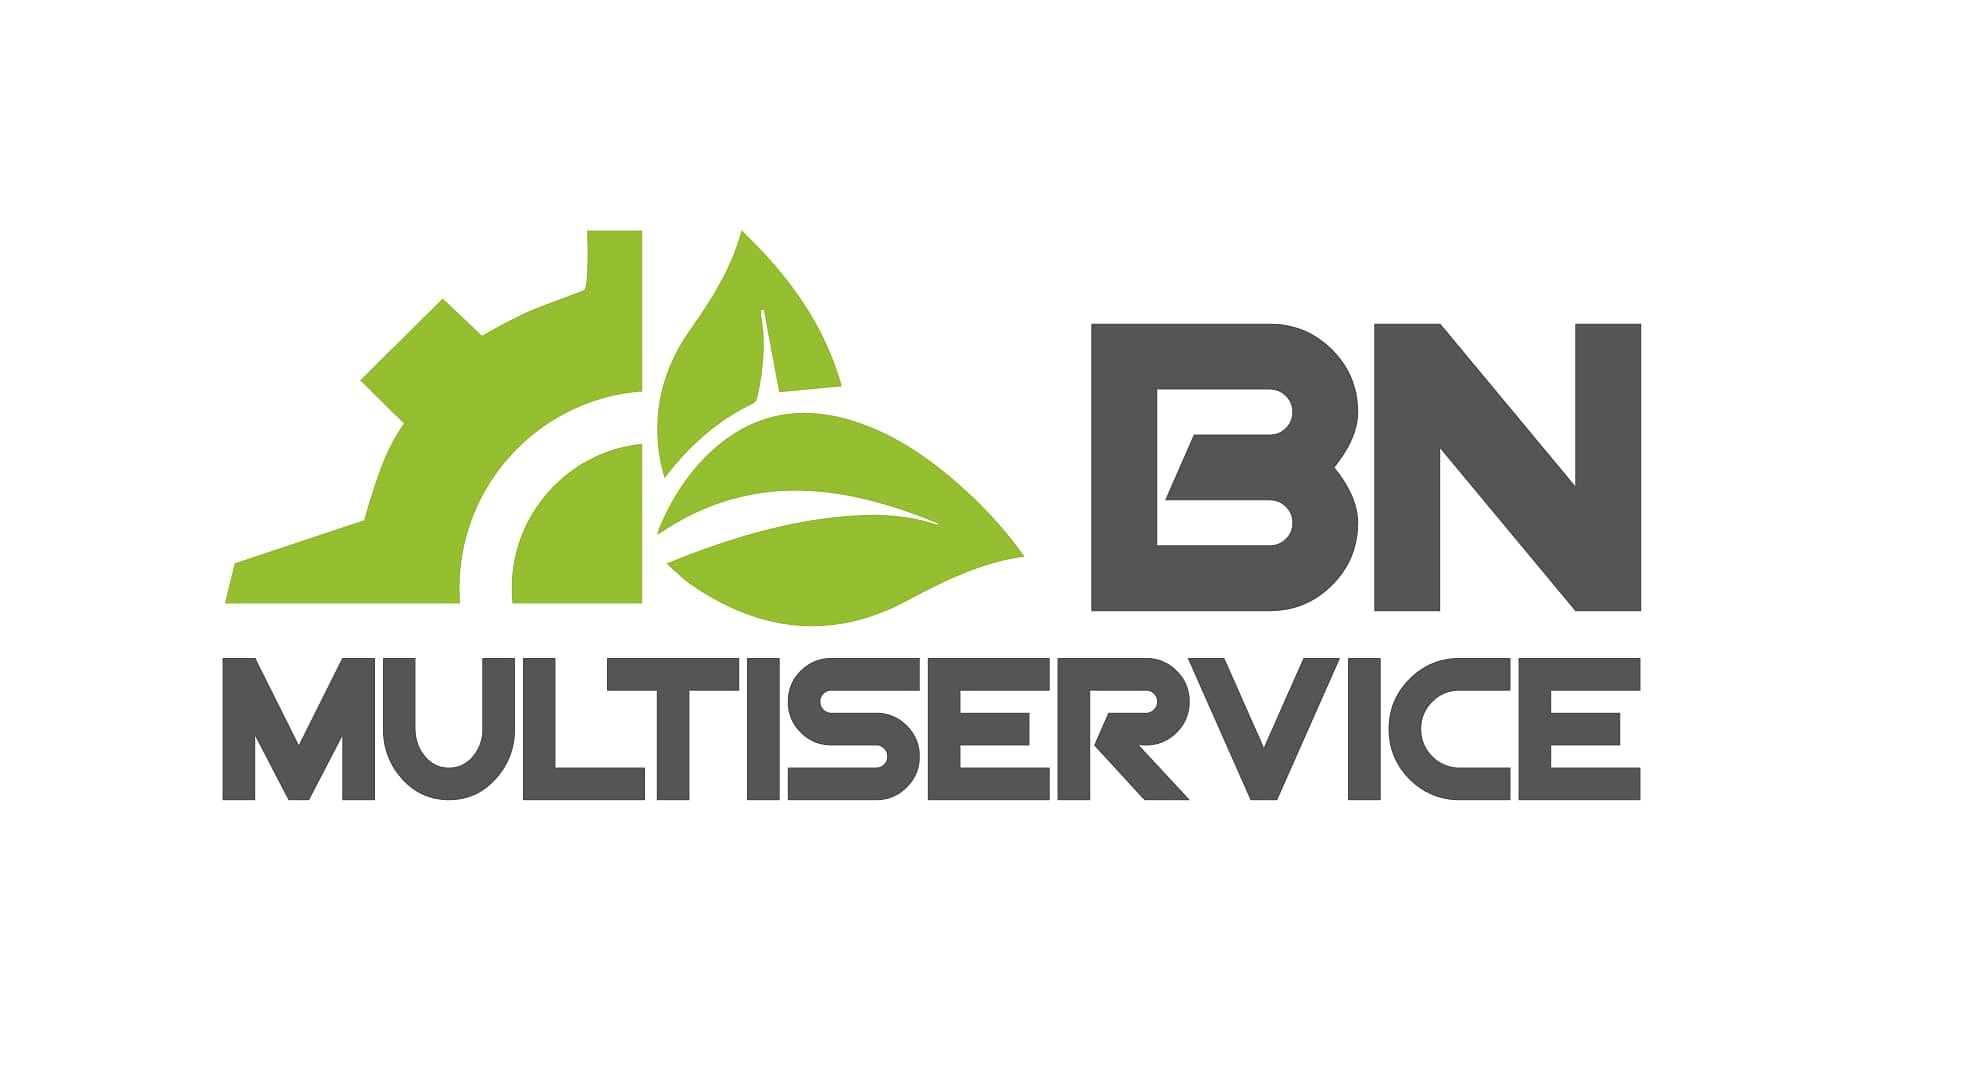 BN Multiservice